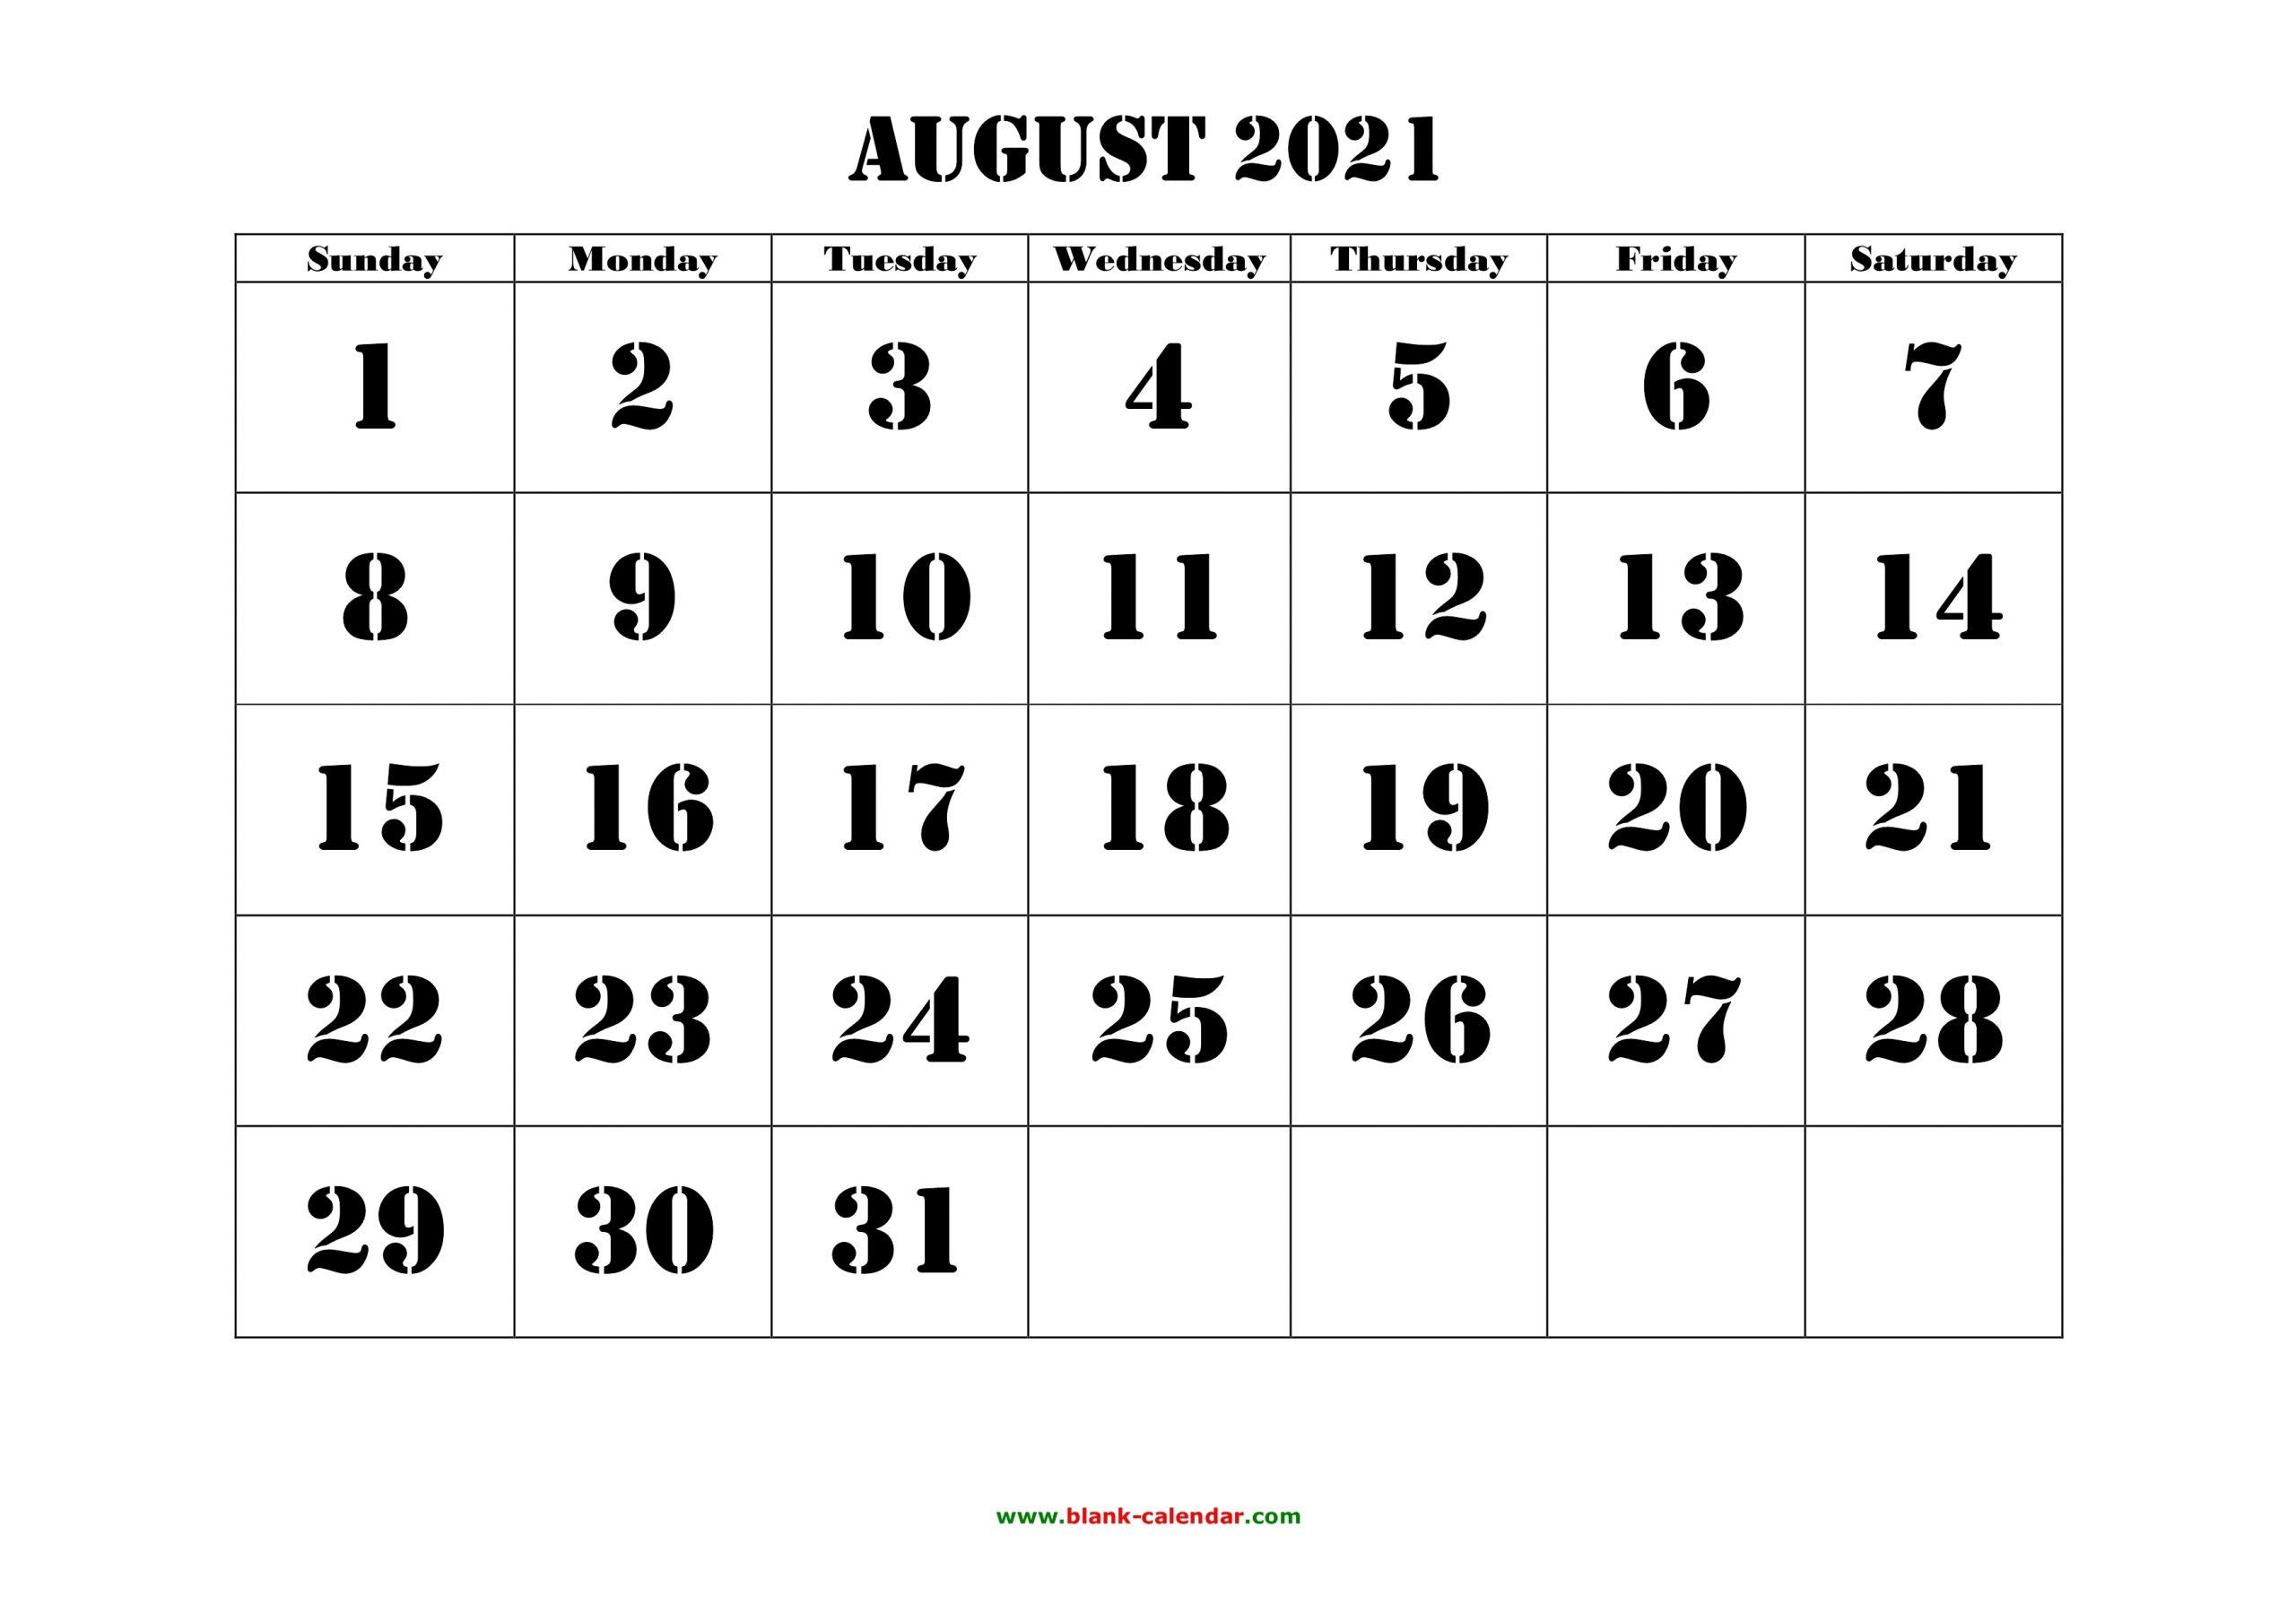 Pick August 2021 Calendar Fill In